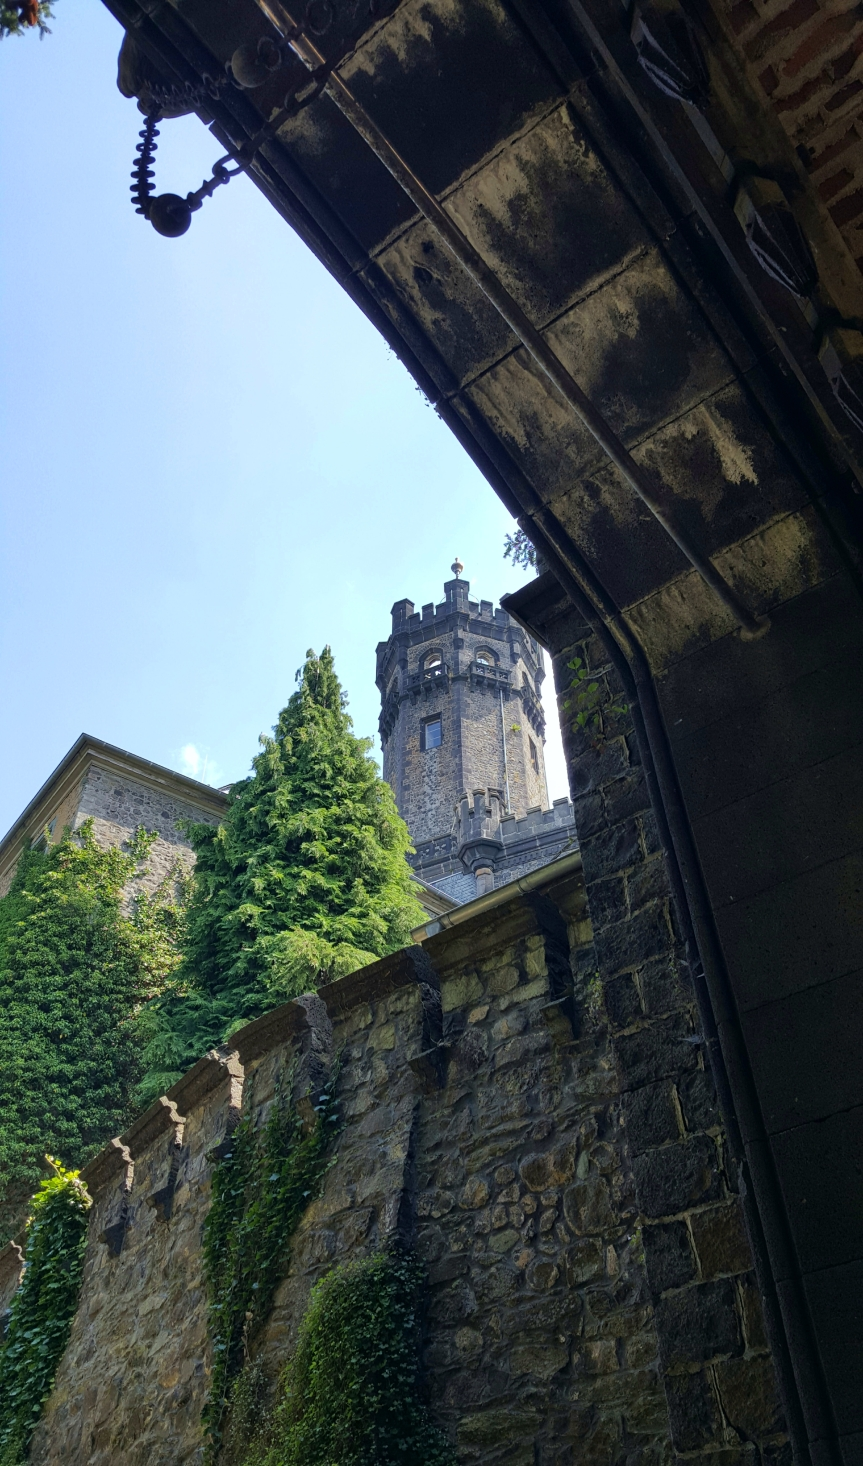 Schaumburg Castle. Photo by Dragonfly Leathrum